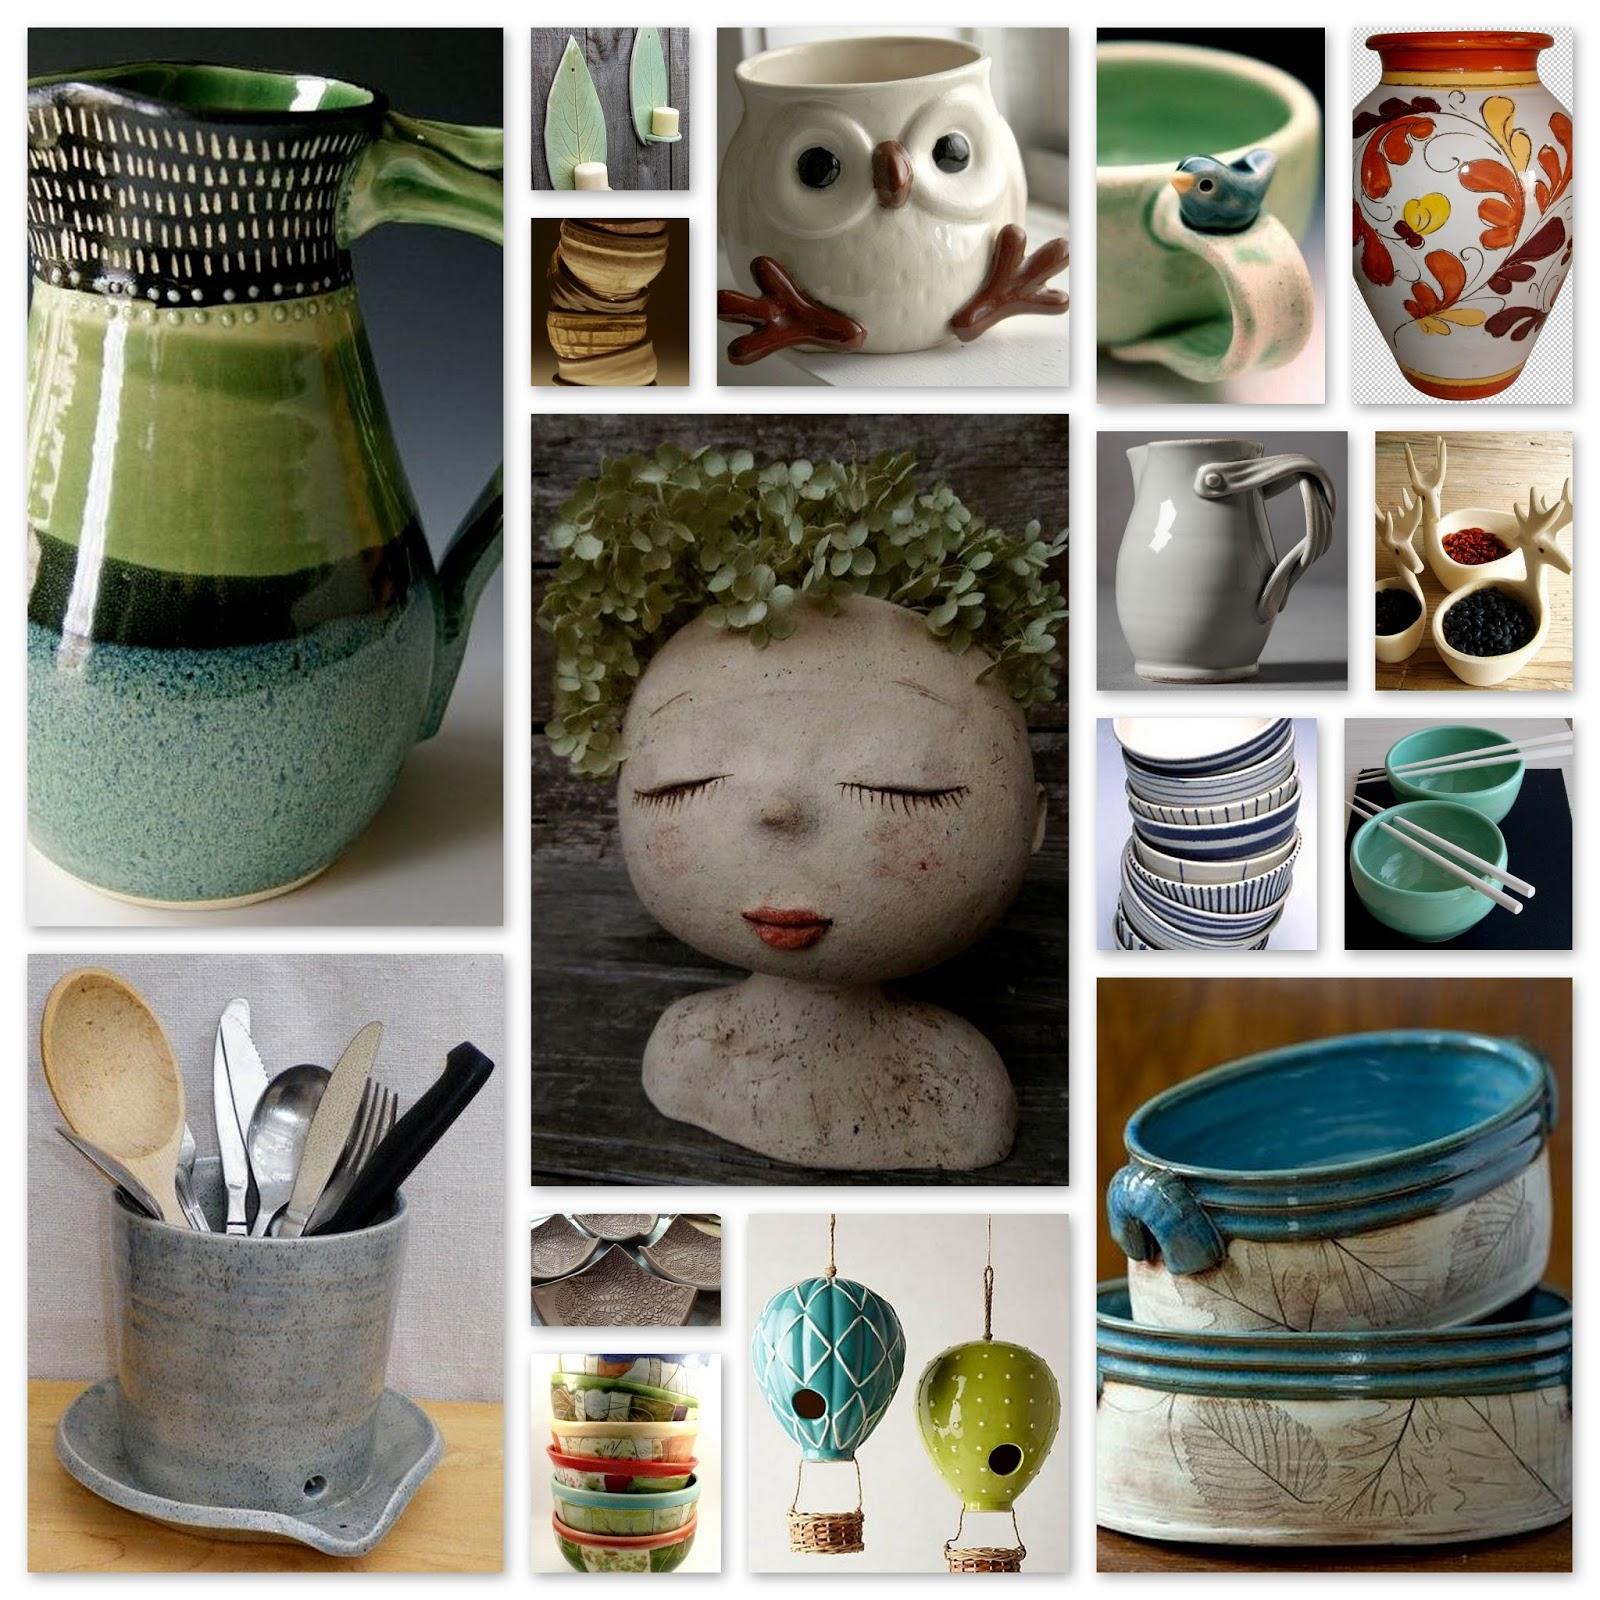 Taller de arte vif cer mica for Oxidos para ceramica